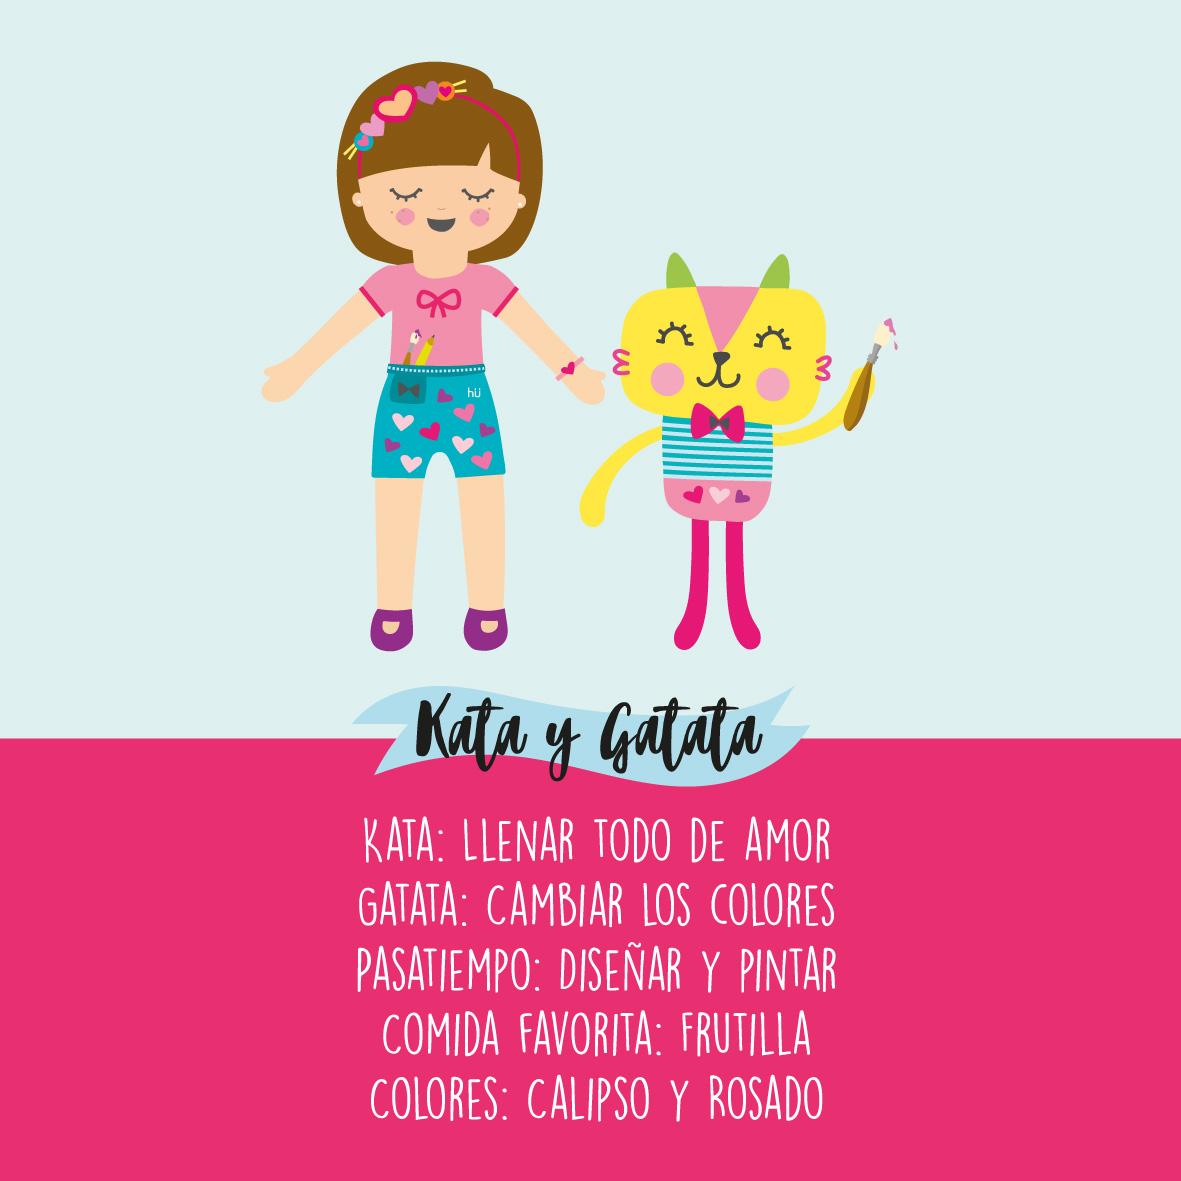 Gatata